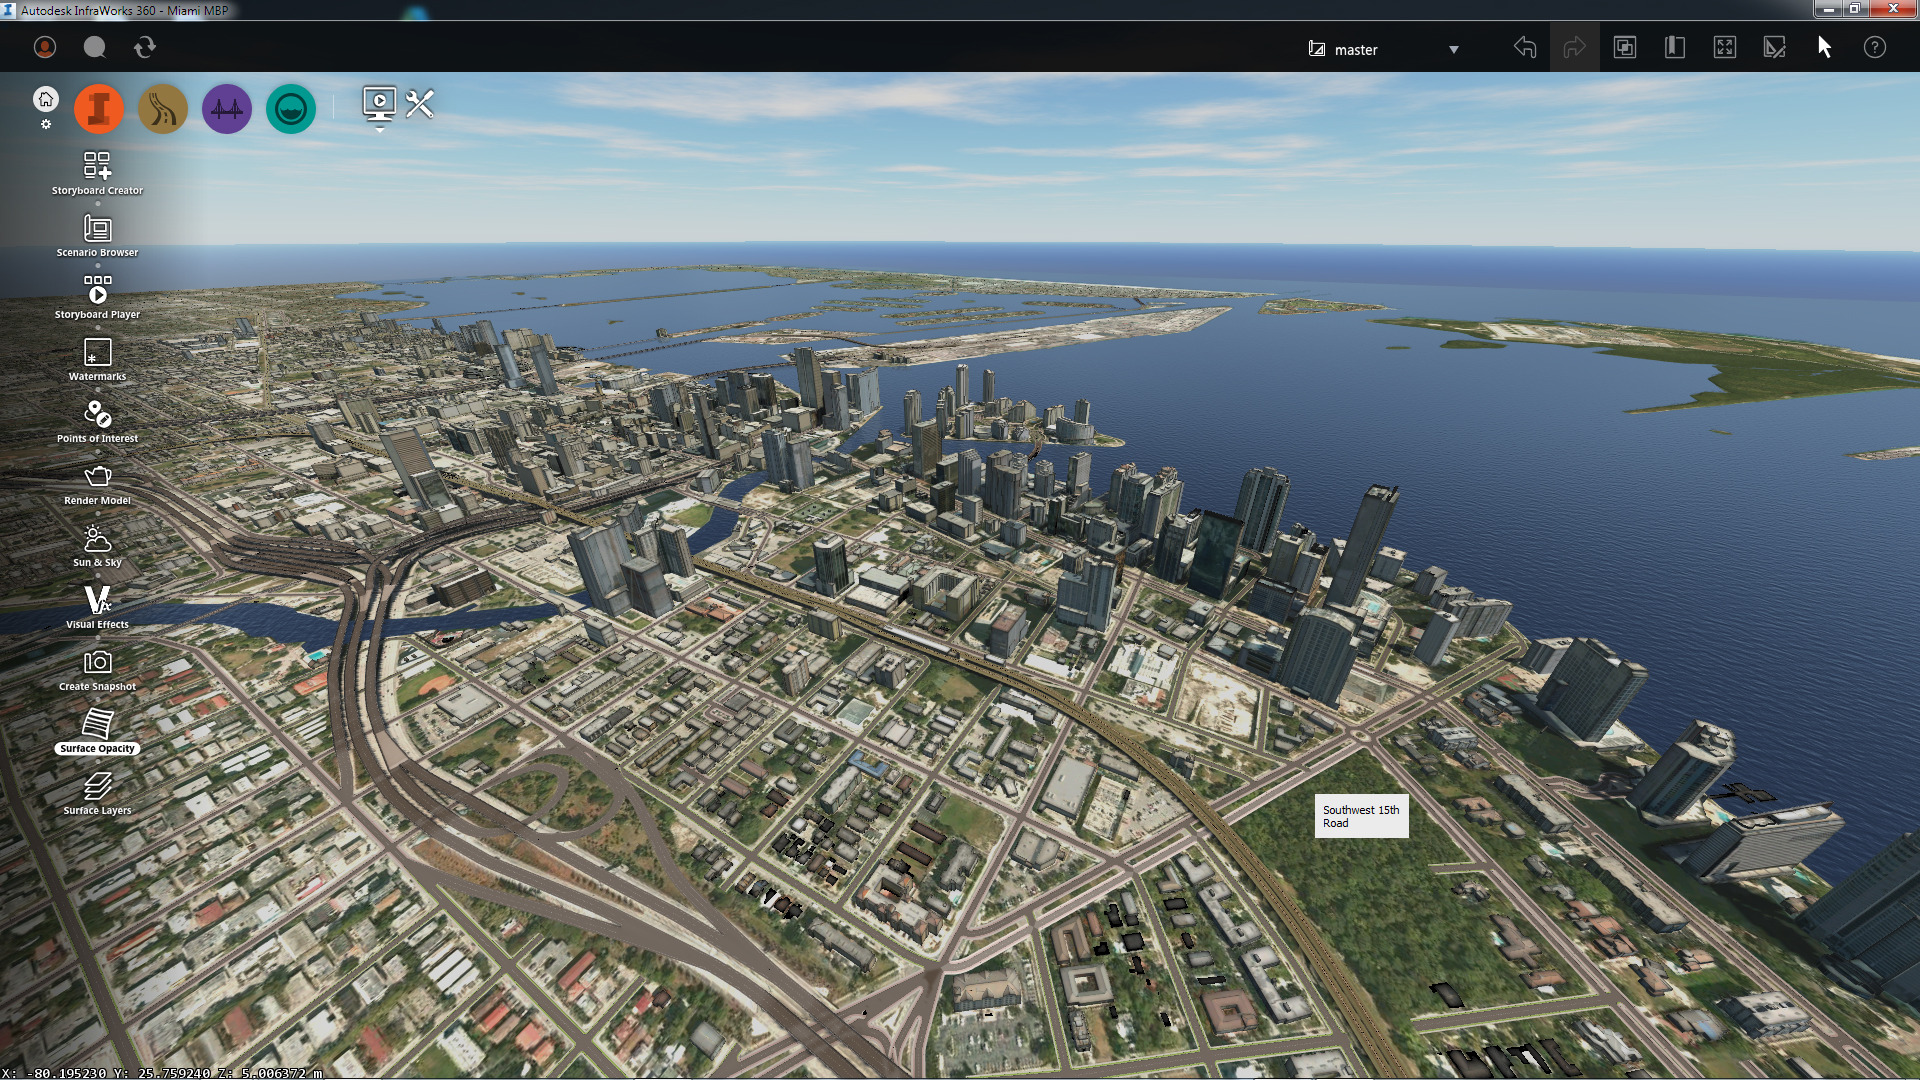 Miami_aiw_de_model_builder_-15_min